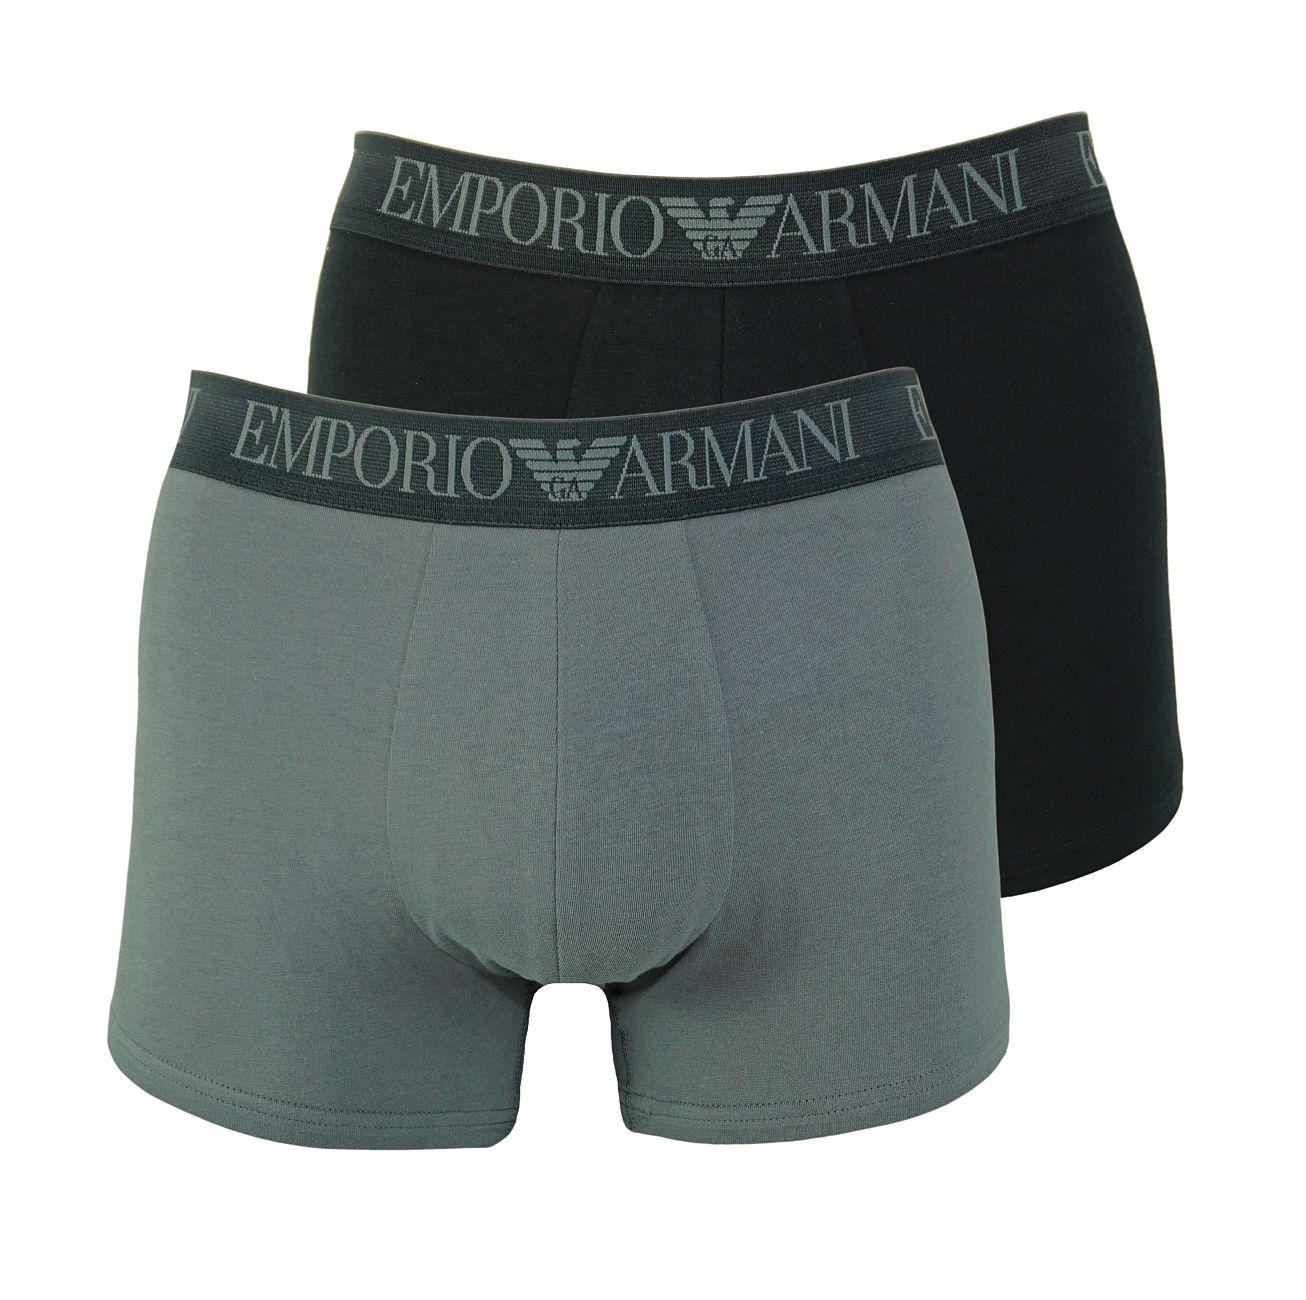 Emporio Armani 2er Pack Trunk Shorts 111769 8P720 41720 NERO/ANTRACITE F18-EAT1